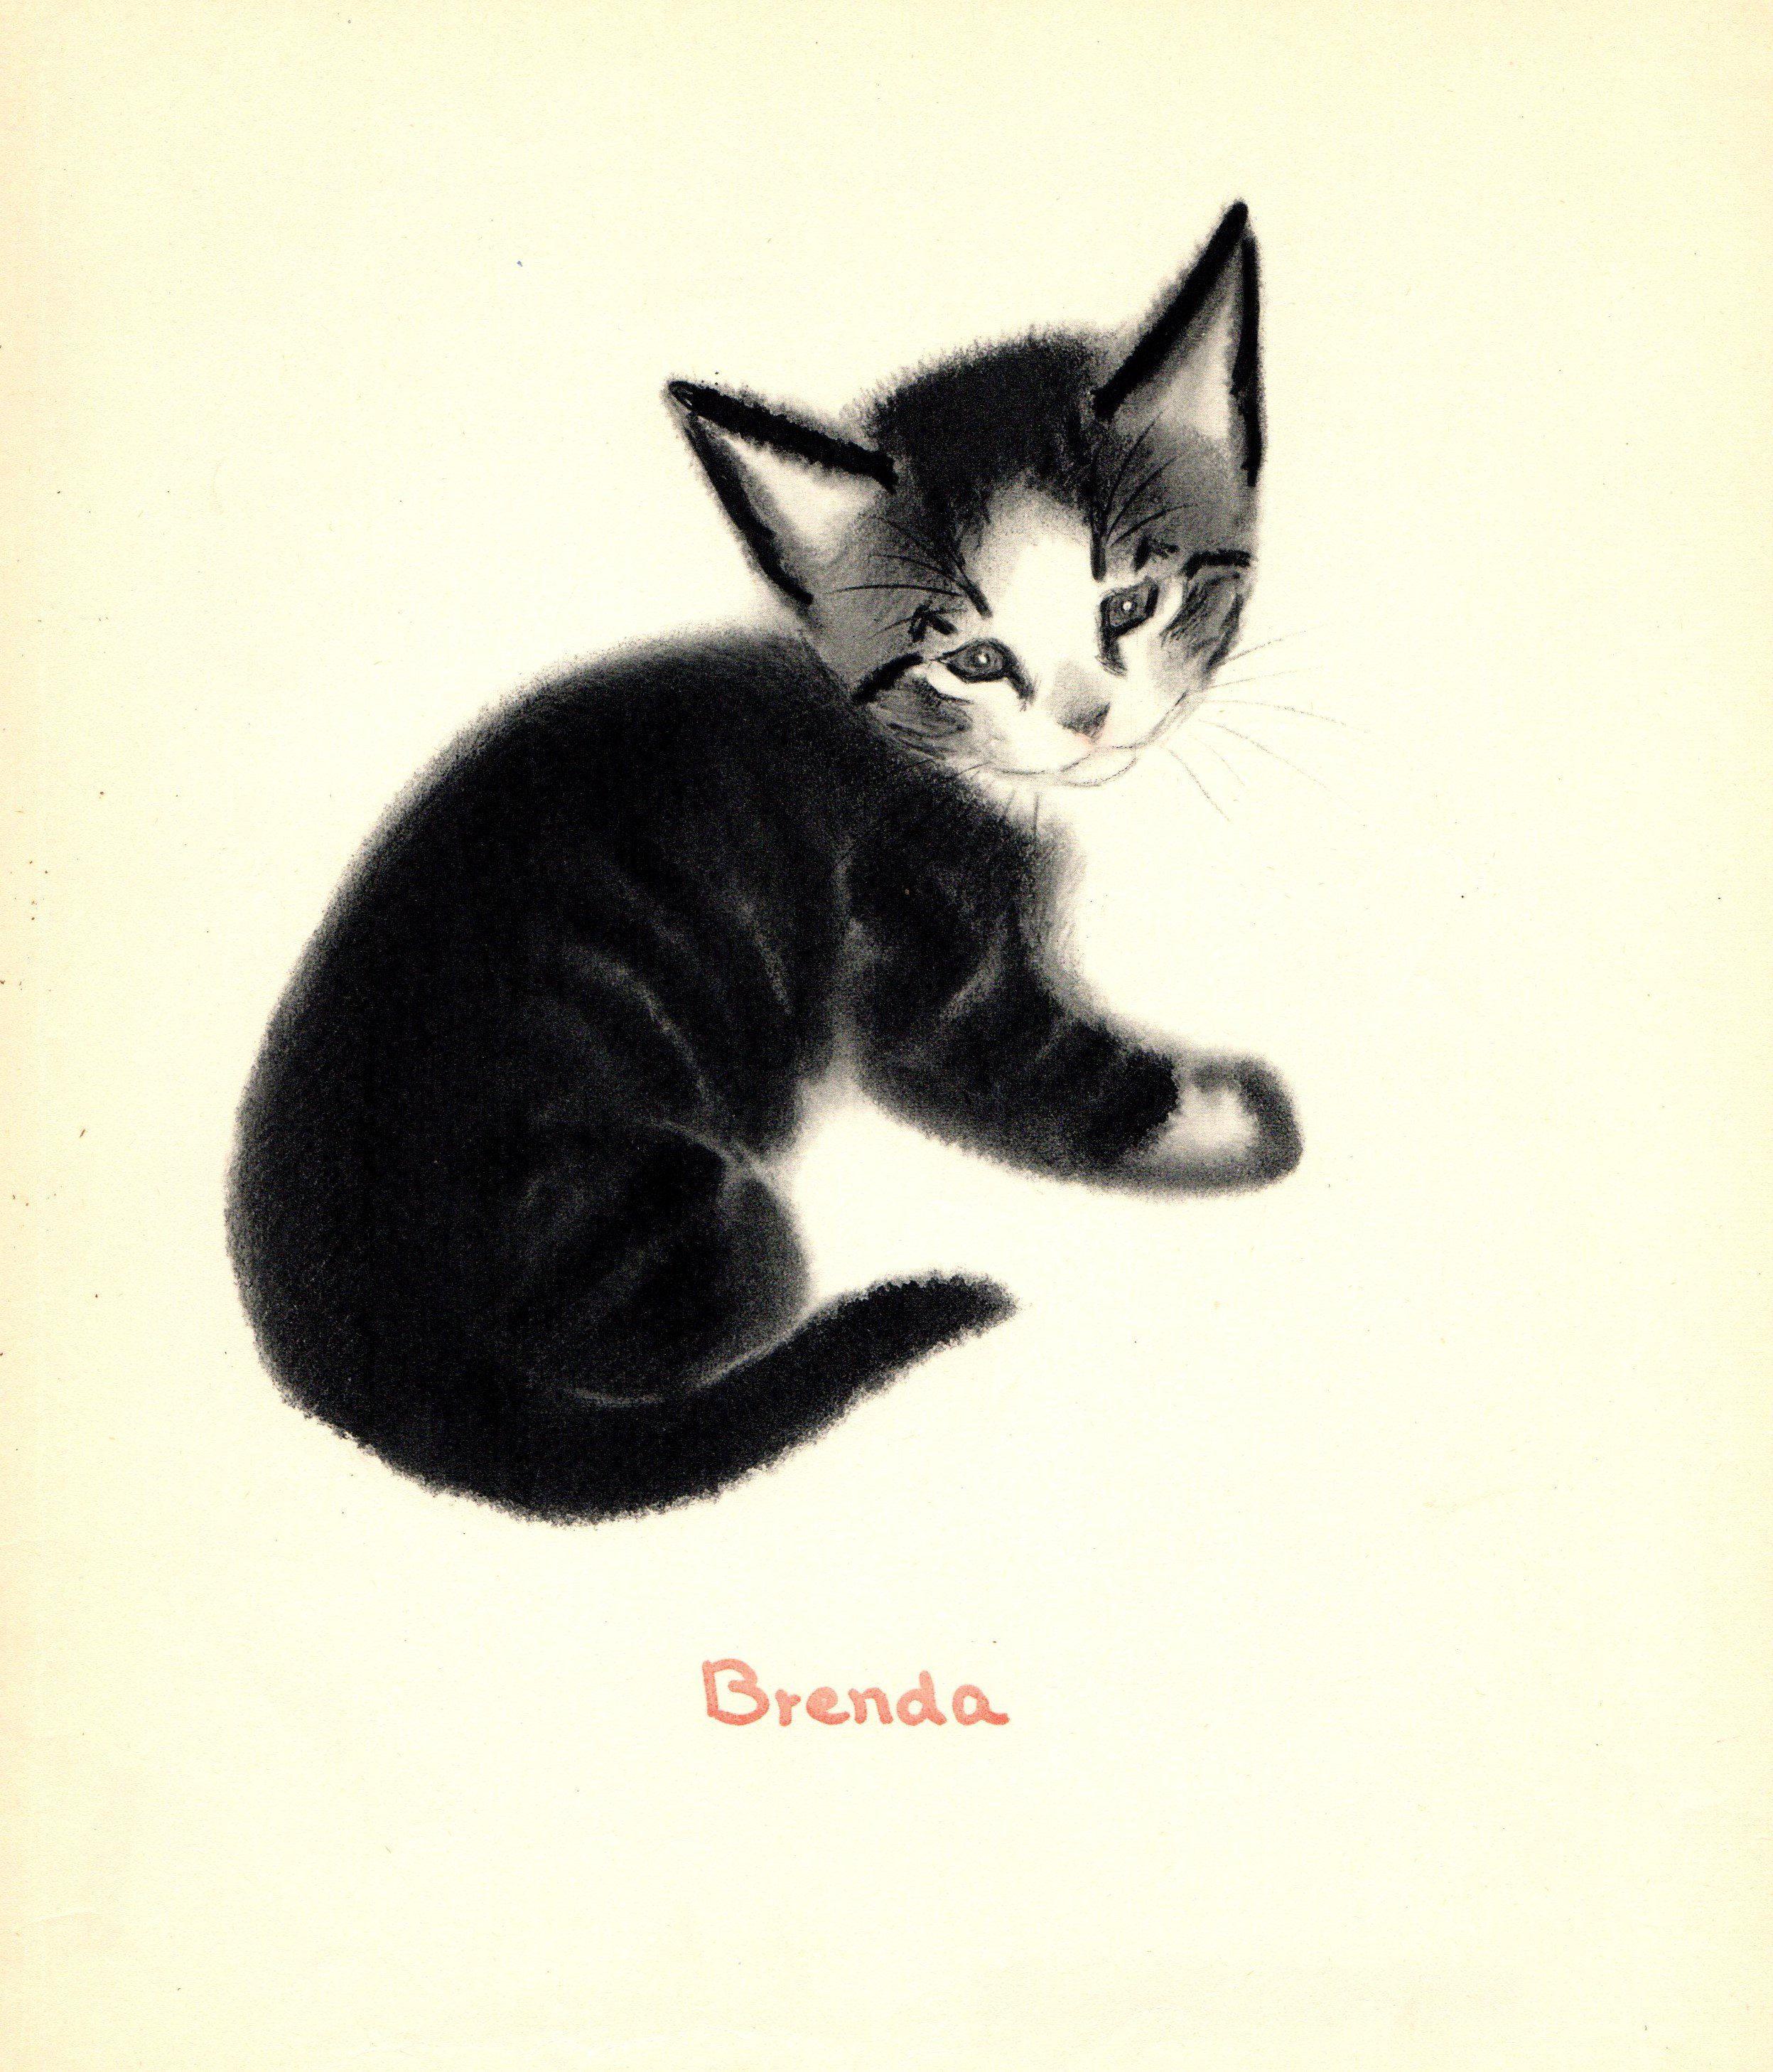 1940s Vintage Black Cat Art Print Brenda The Kitten Black Cat Art Cat Art Cat Art Print